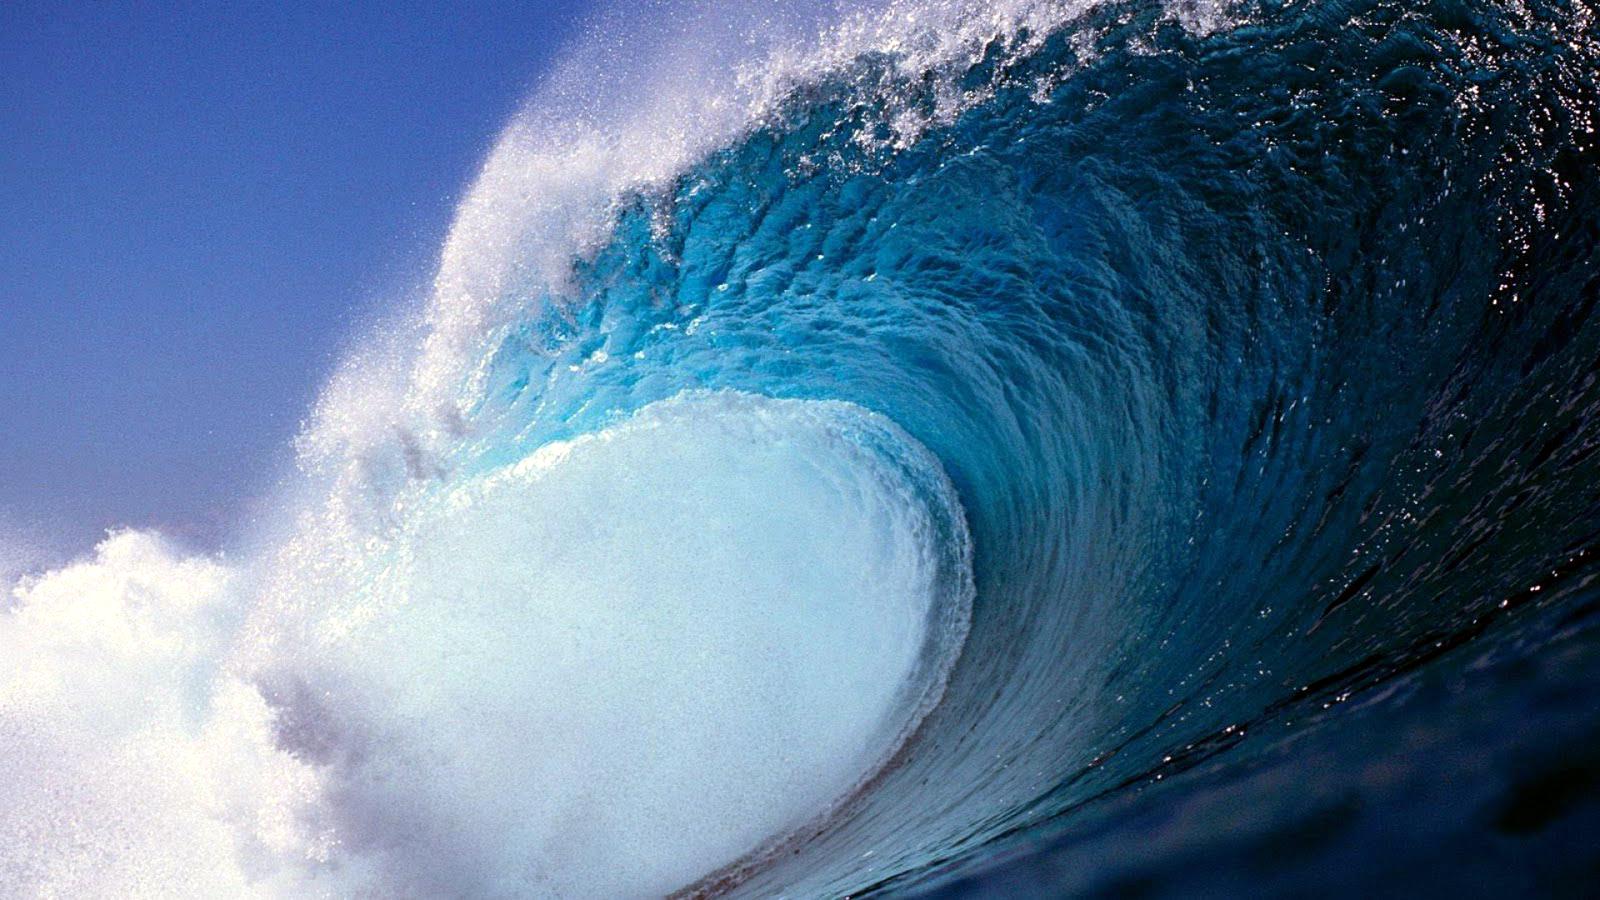 Beautiful ocean wallpaper hd desktop background 1600x900